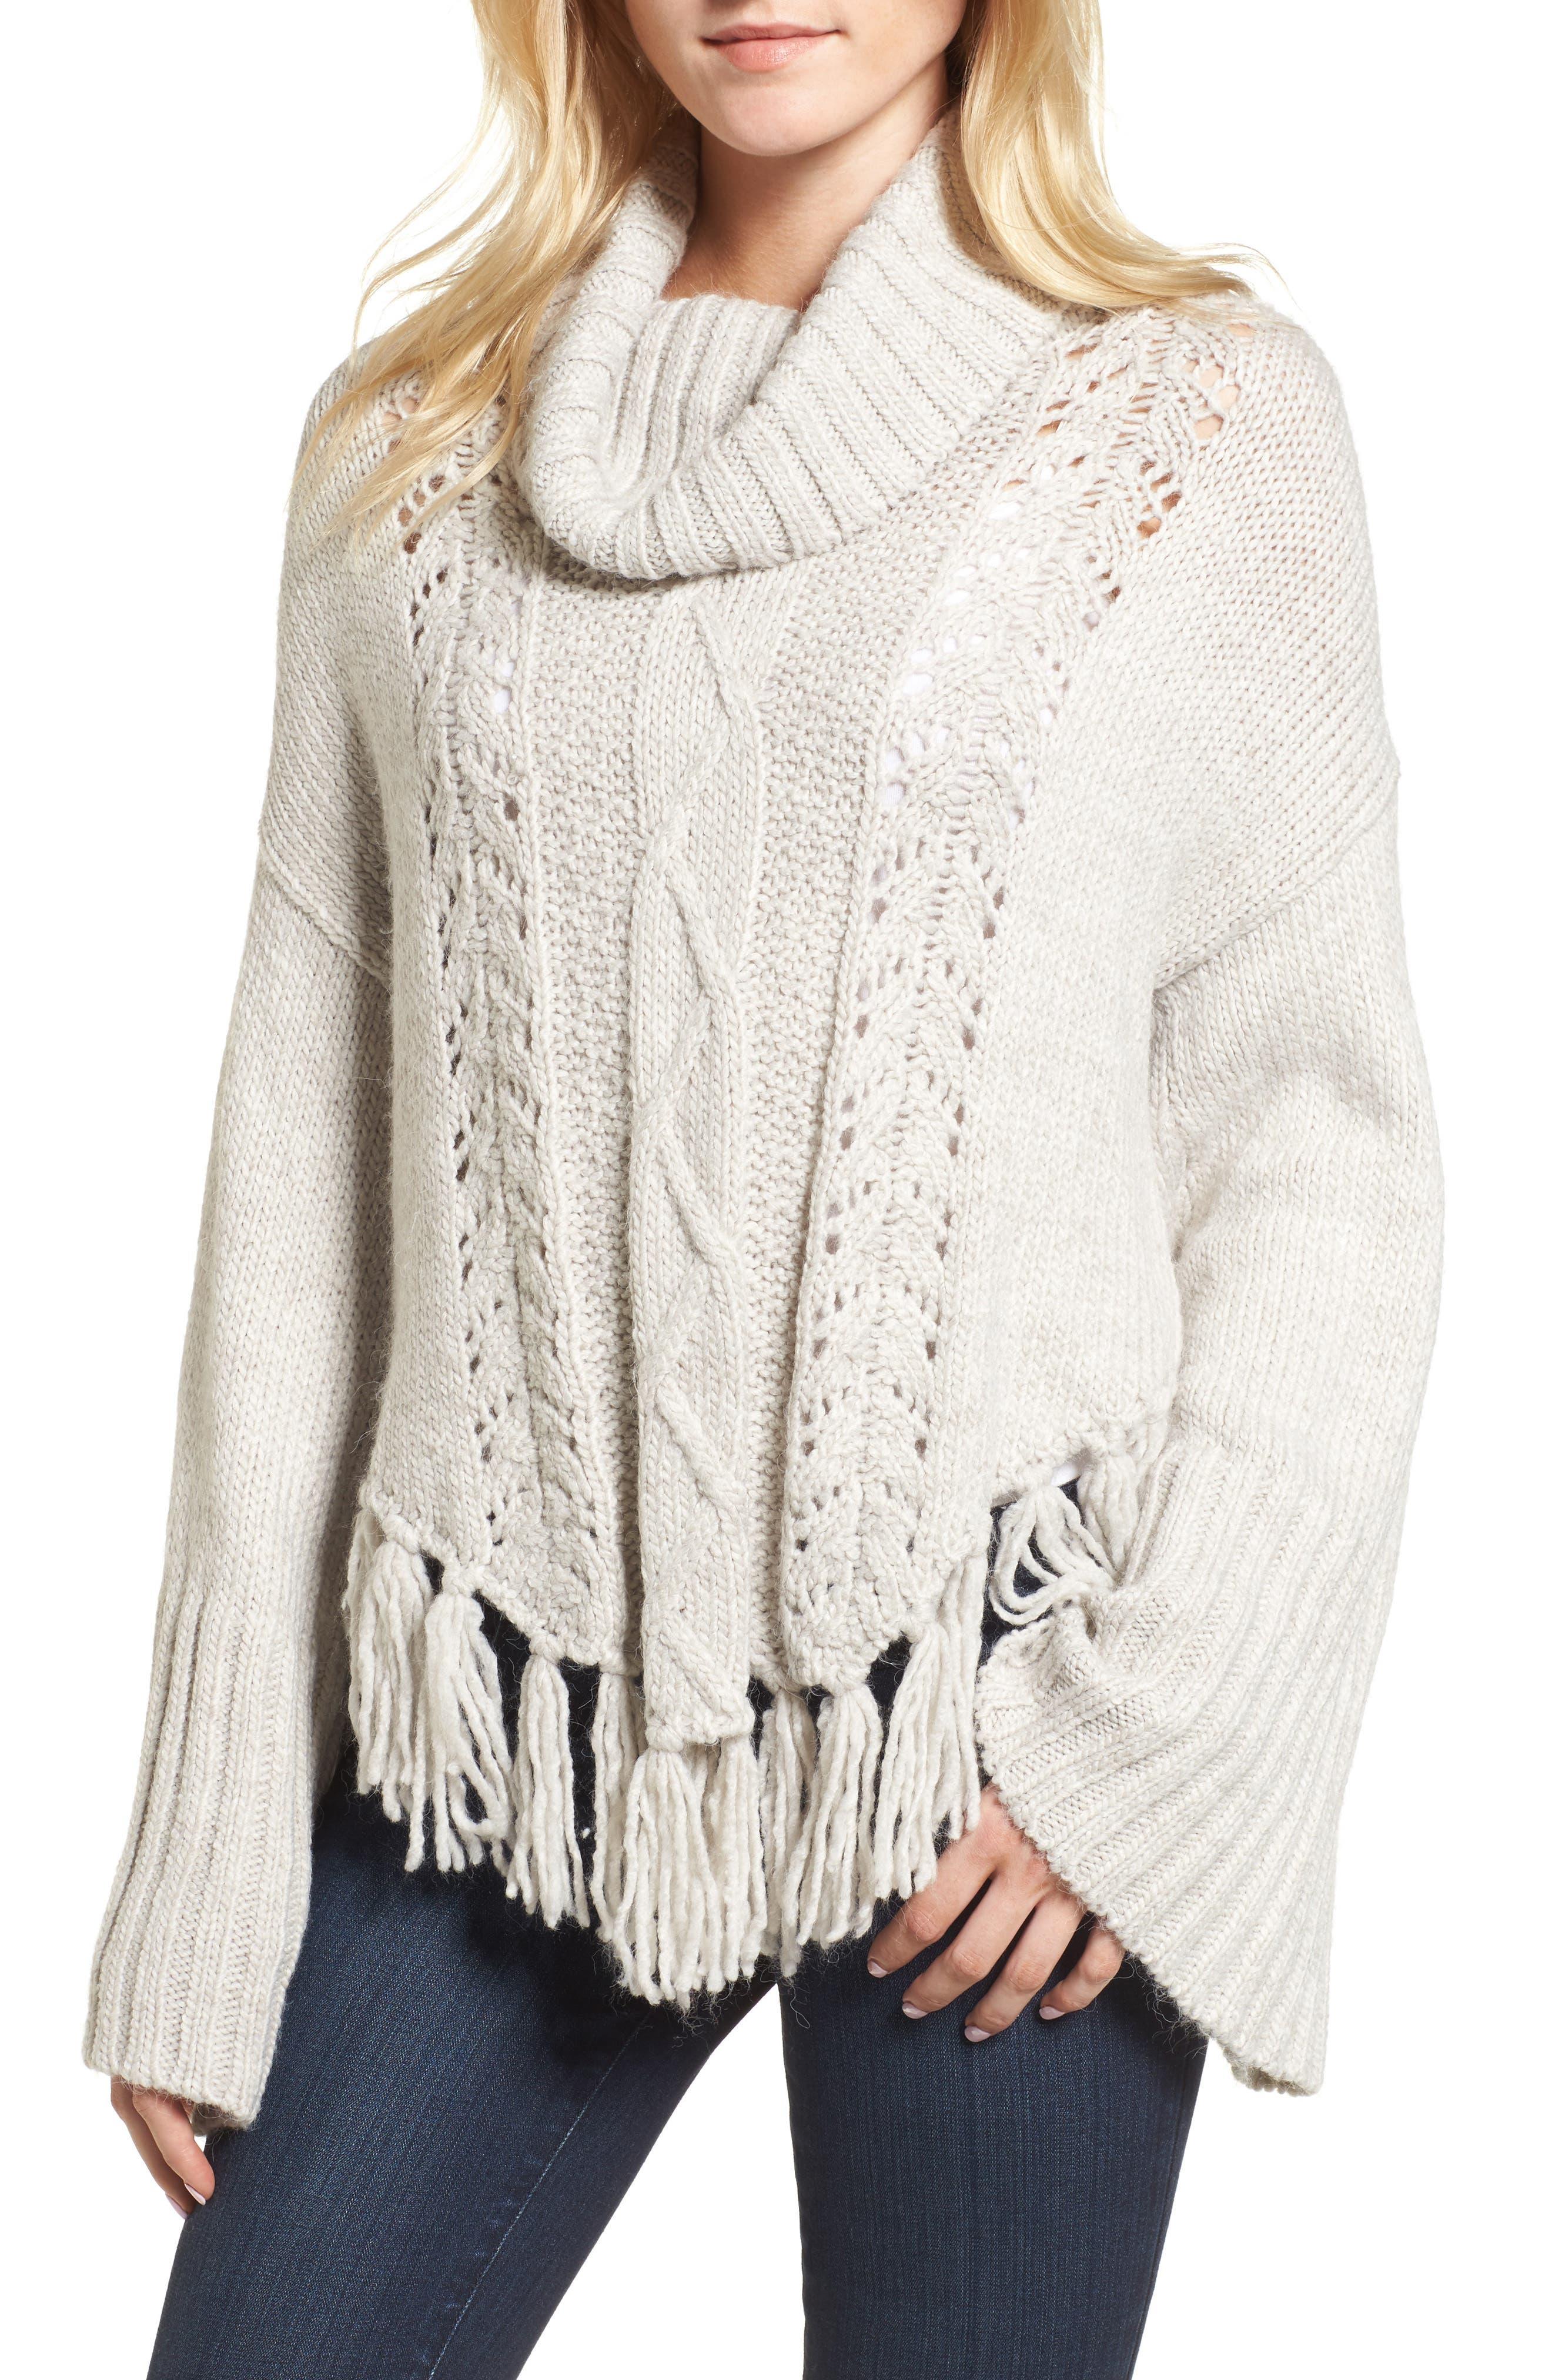 Prilla Fringe Cowl Neck Sweater,                             Main thumbnail 1, color,